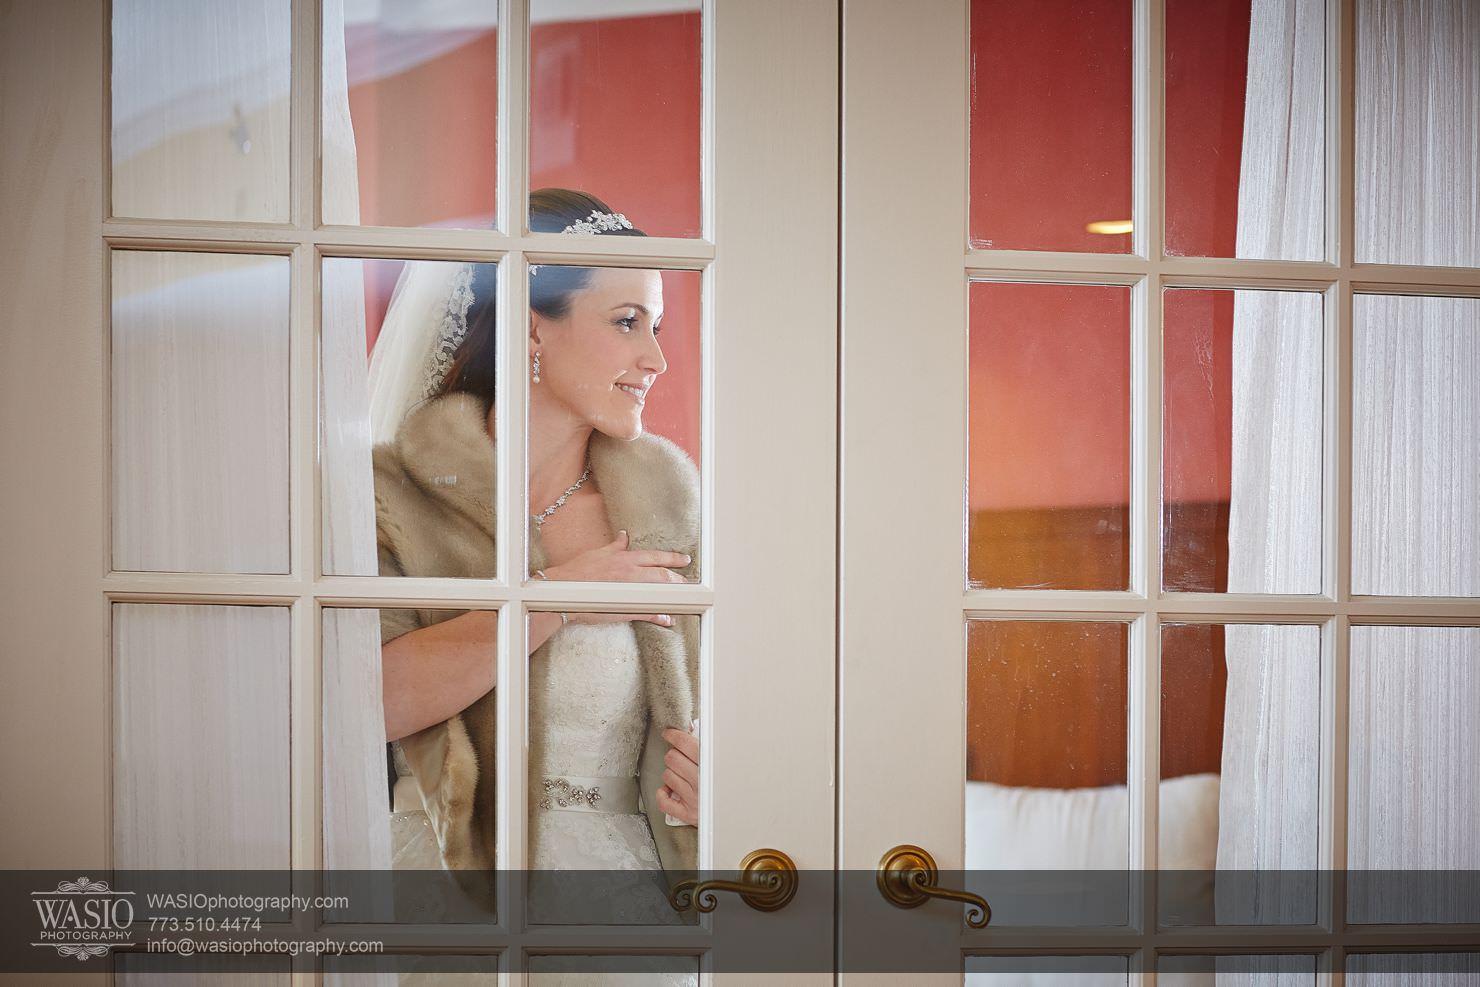 Rosemont-Fall-Wedding-Lauren-and-David-004 Rosemont Fall Wedding - Lauren + David